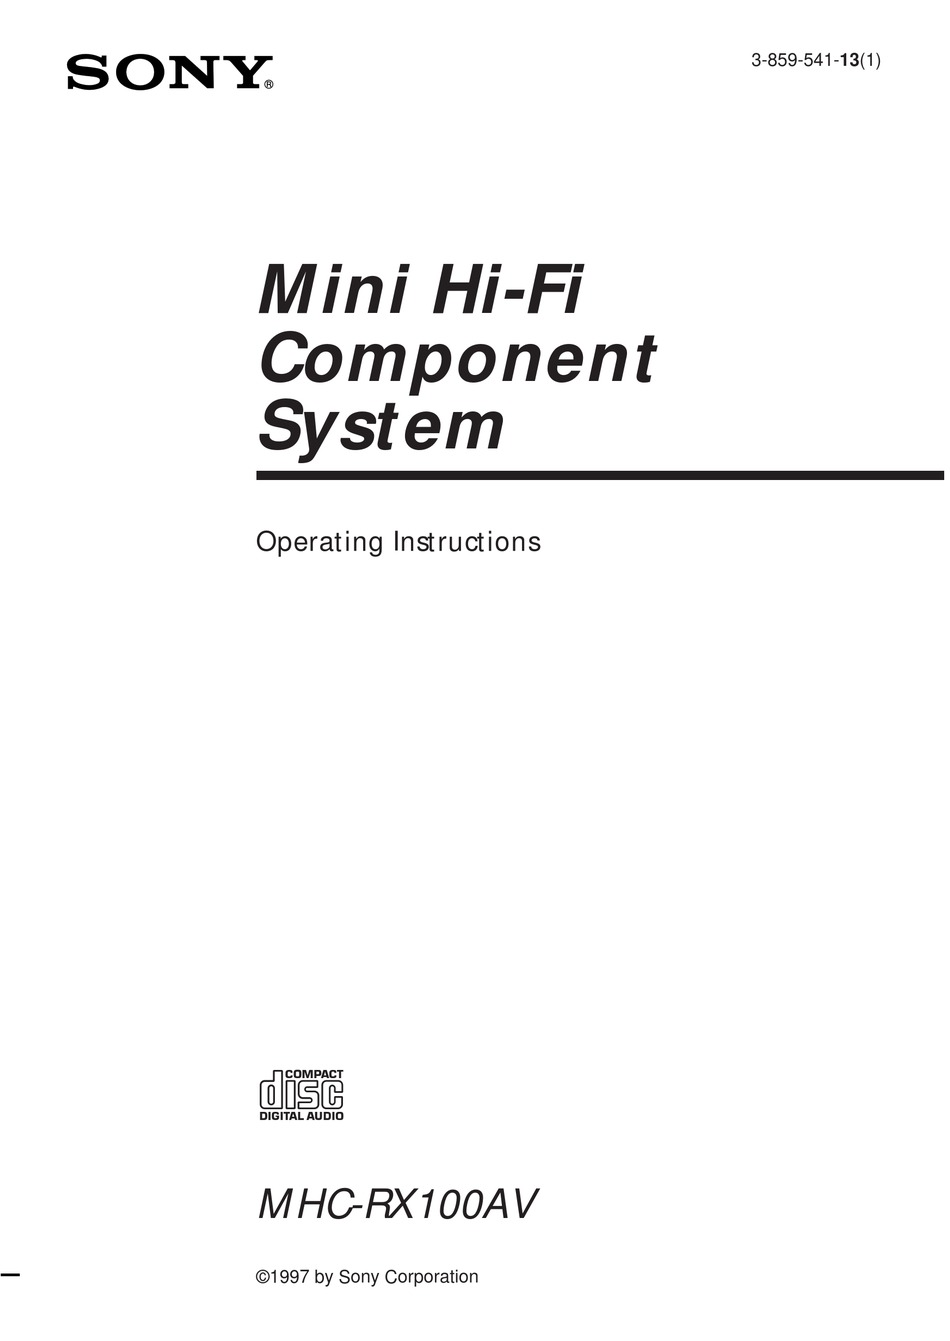 SONY MHC-RX100AV OPERATING INSTRUCTIONS MANUAL Pdf